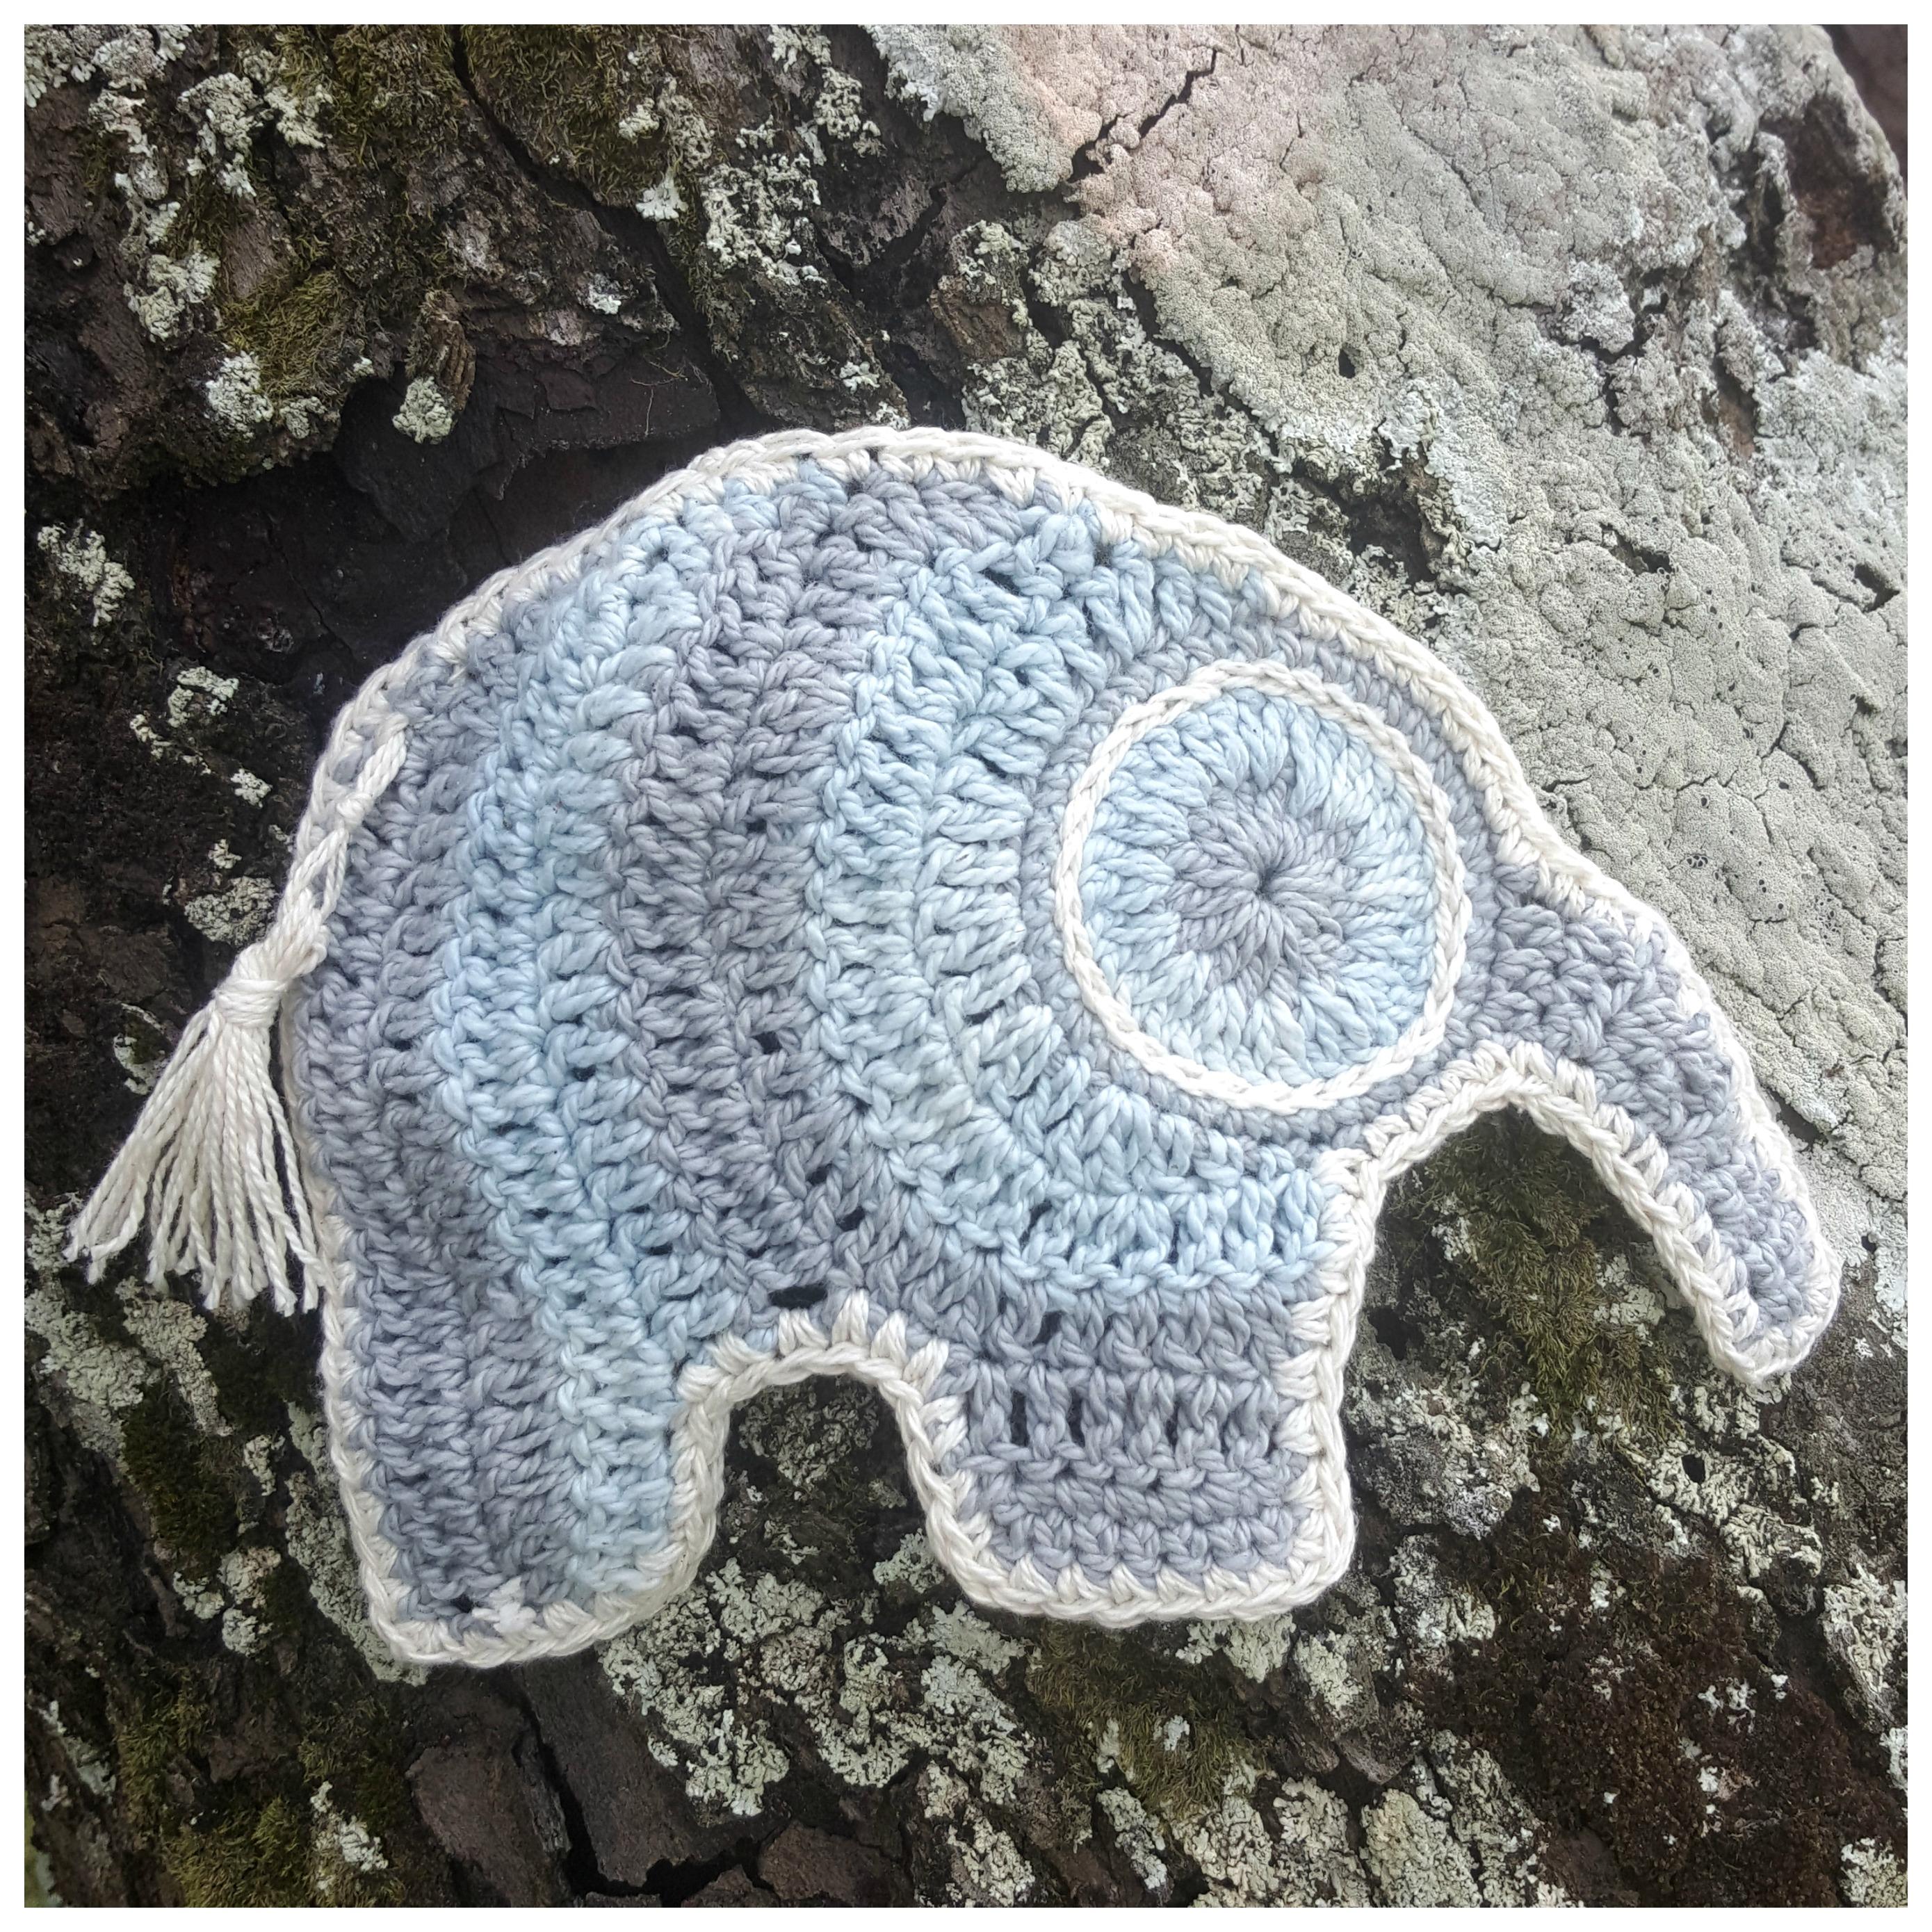 How To Crochet Elephant Edging - Pretty Ideas | 2779x2779